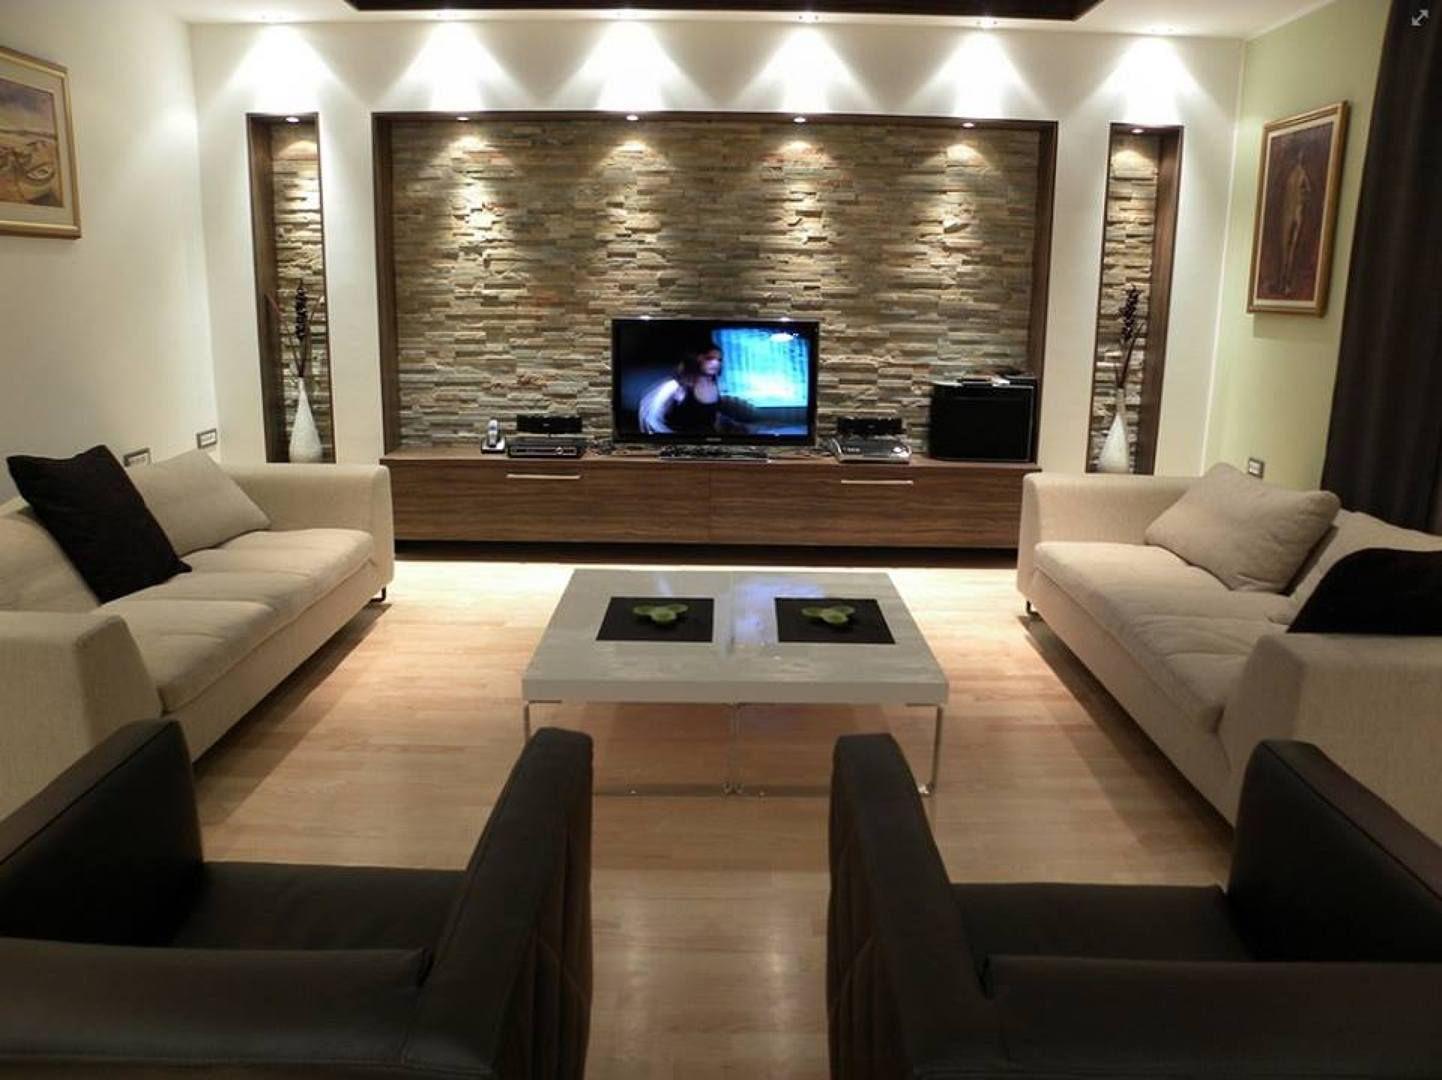 Salas Modernas Furniture Pinterest Moderno Decoracion De  -> Salas Decoradas Modernas Fotos